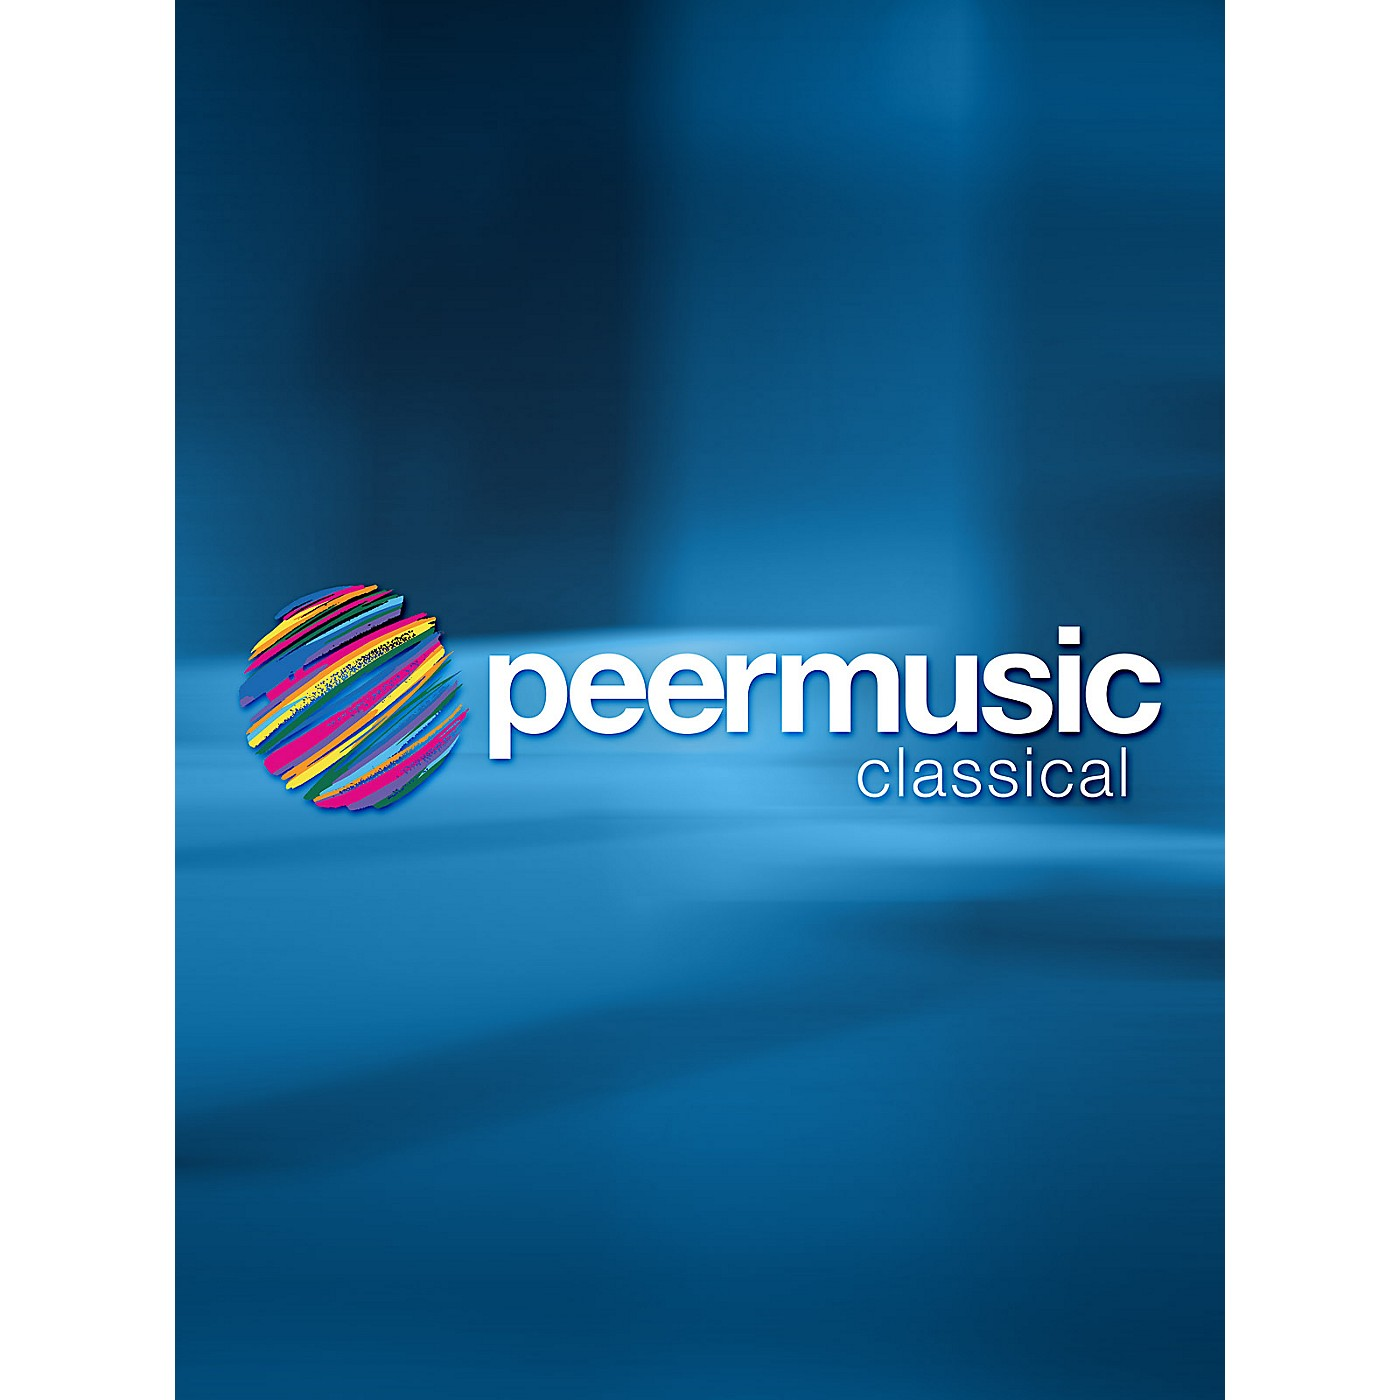 Peer Music Trois Chansons et Danses Espagnoles (Piano Solo) Peermusic Classical Series Softcover thumbnail